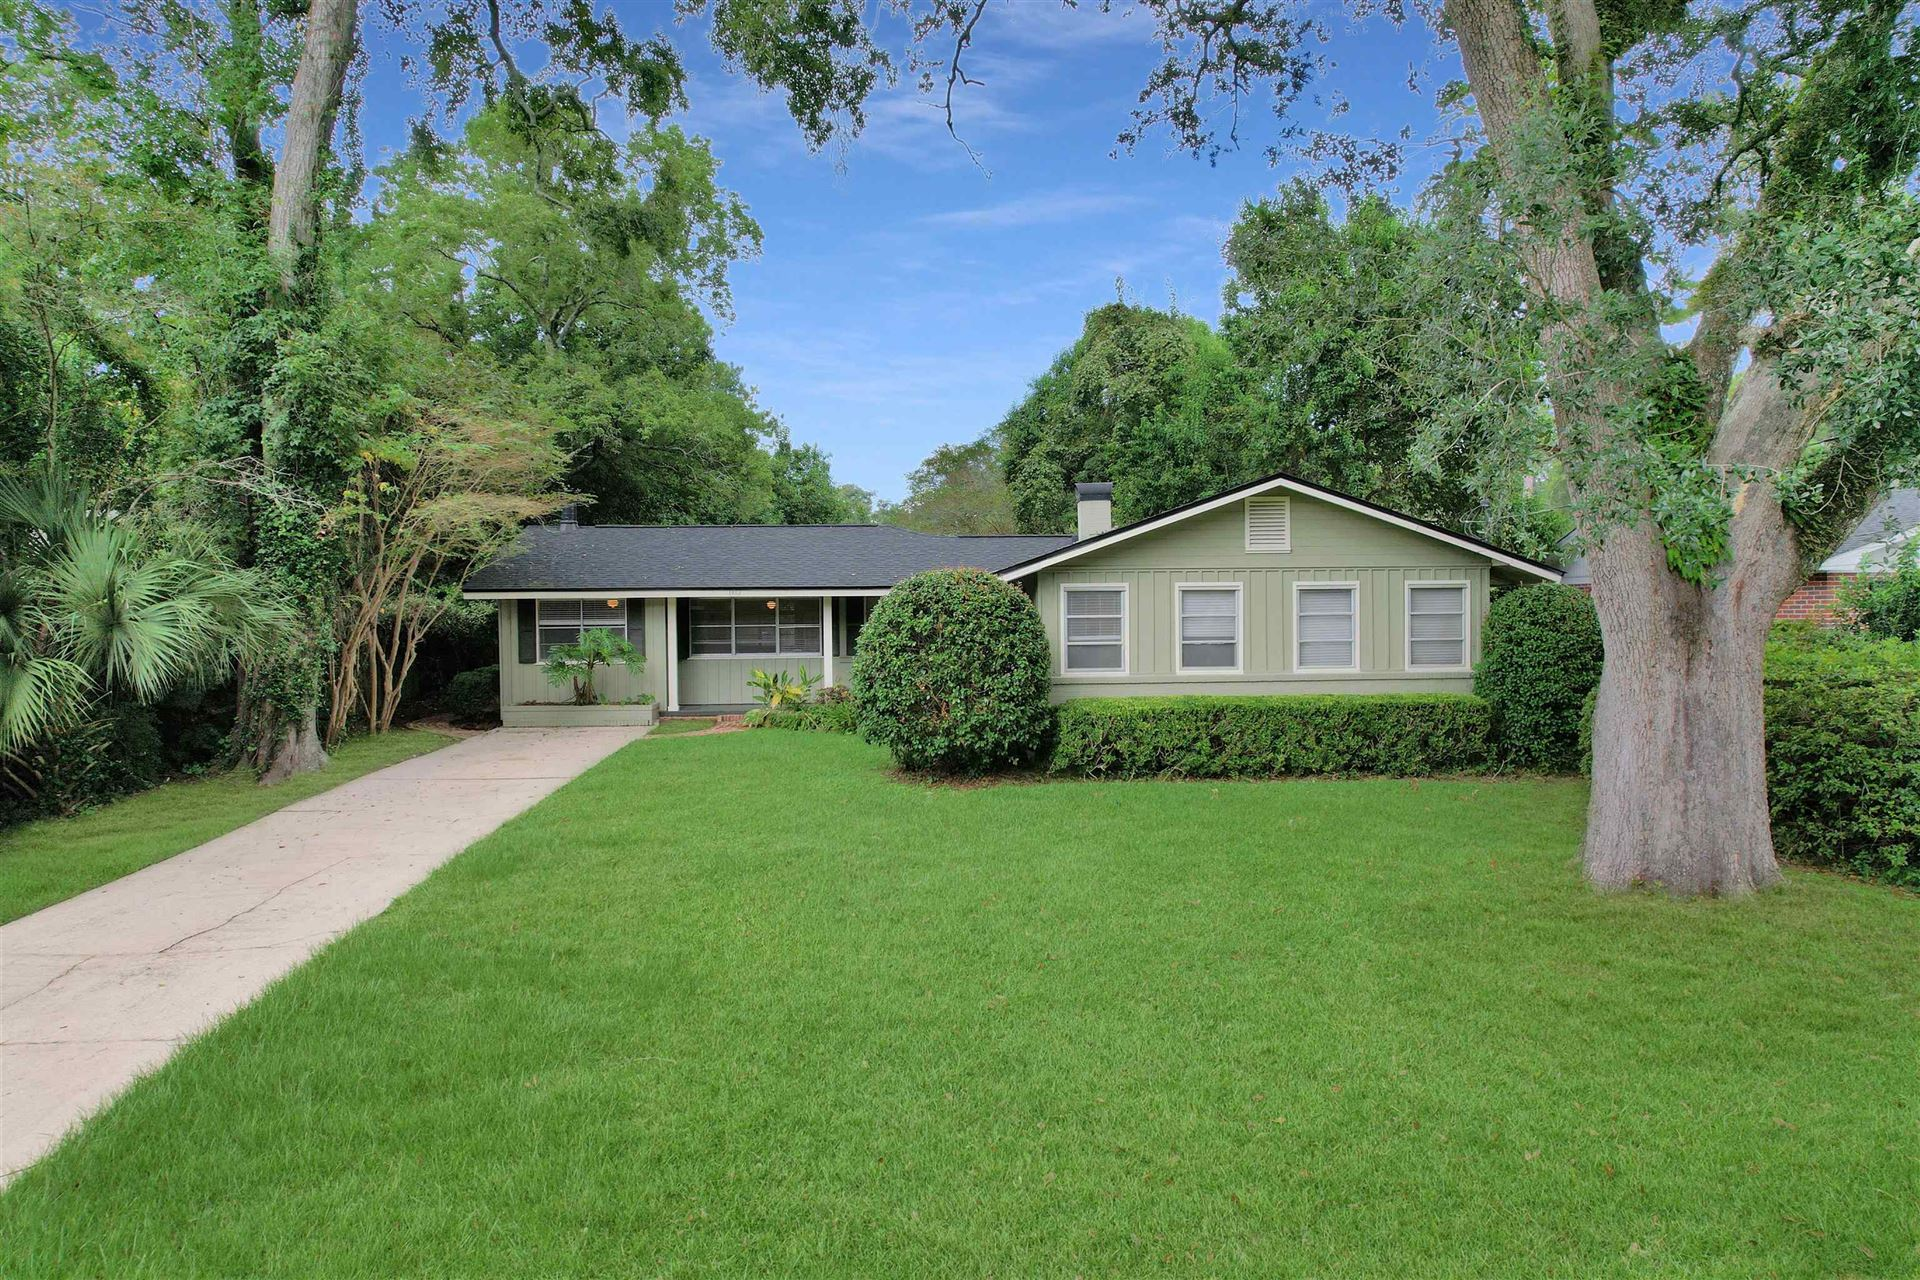 Photo of 1412 Shuffield Drive, TALLAHASSEE, FL 32308 (MLS # 337590)